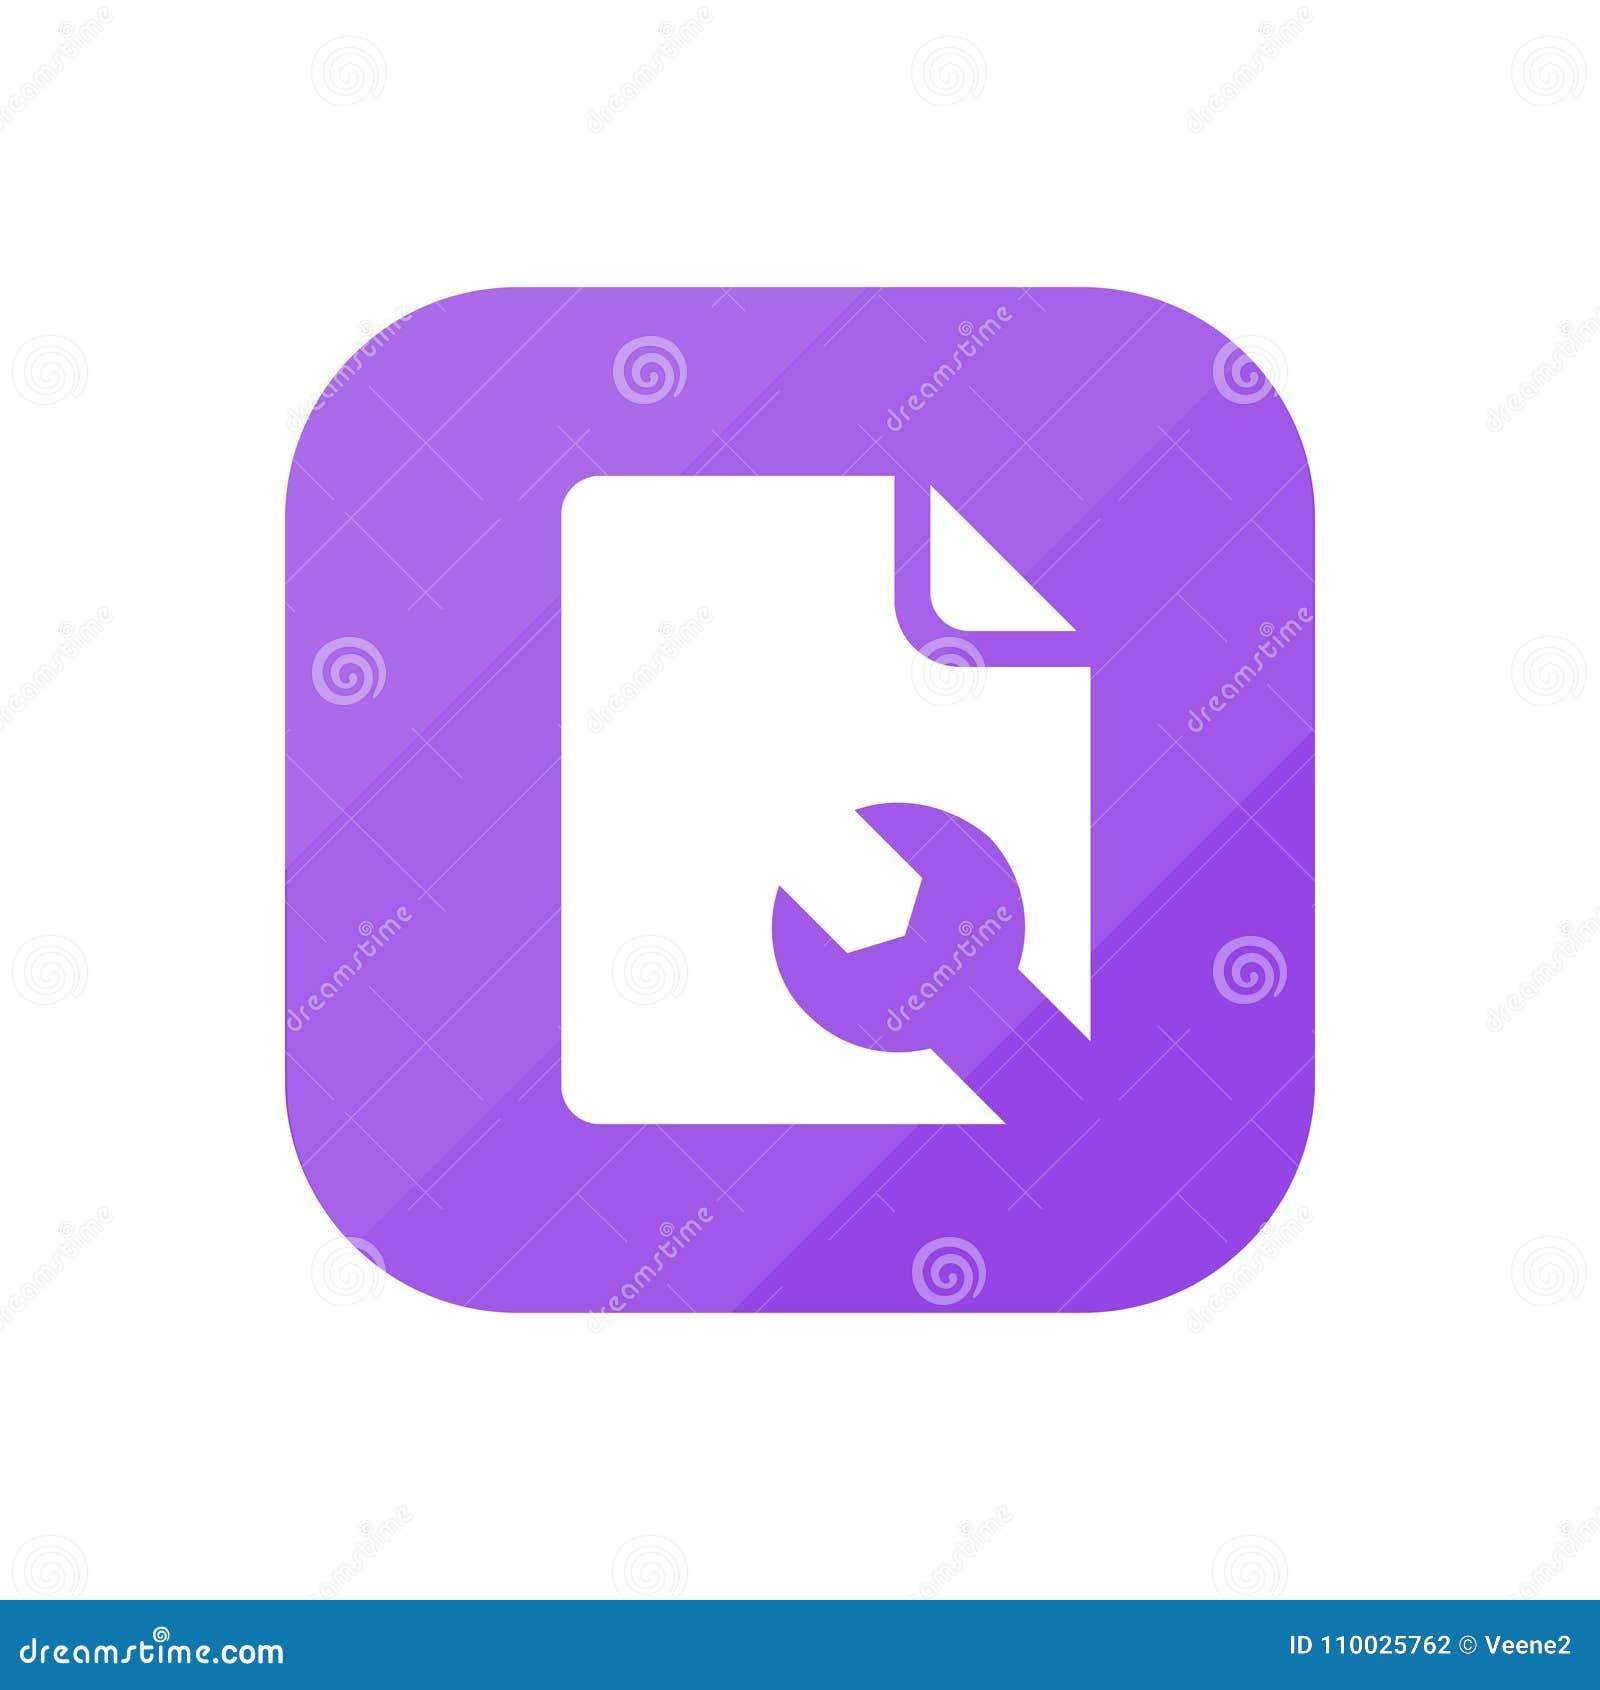 Paginamontages - App Pictogram